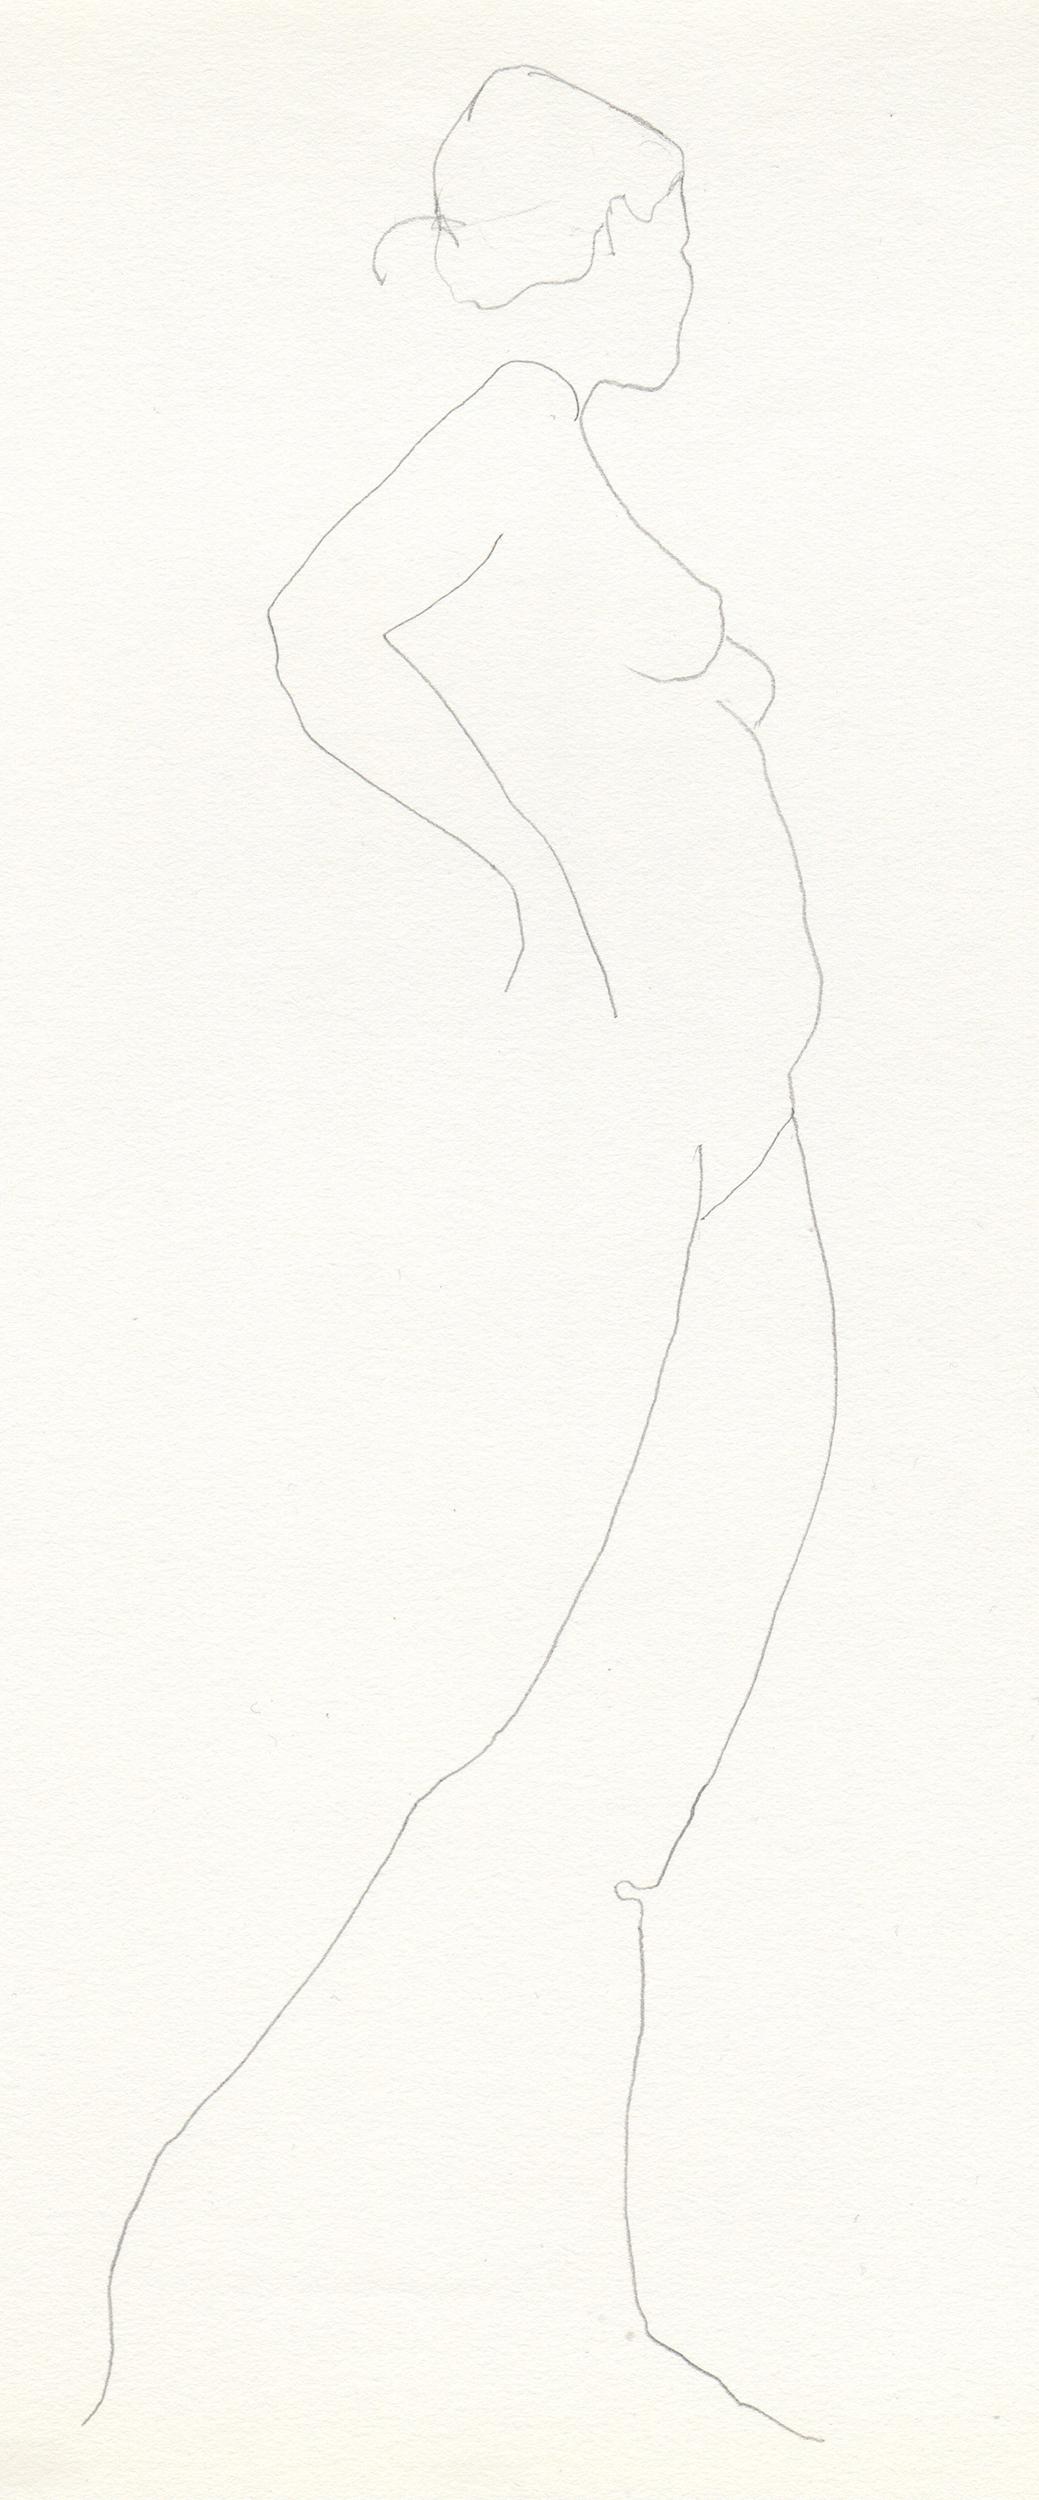 2012_Sketch_F-Beudin_029